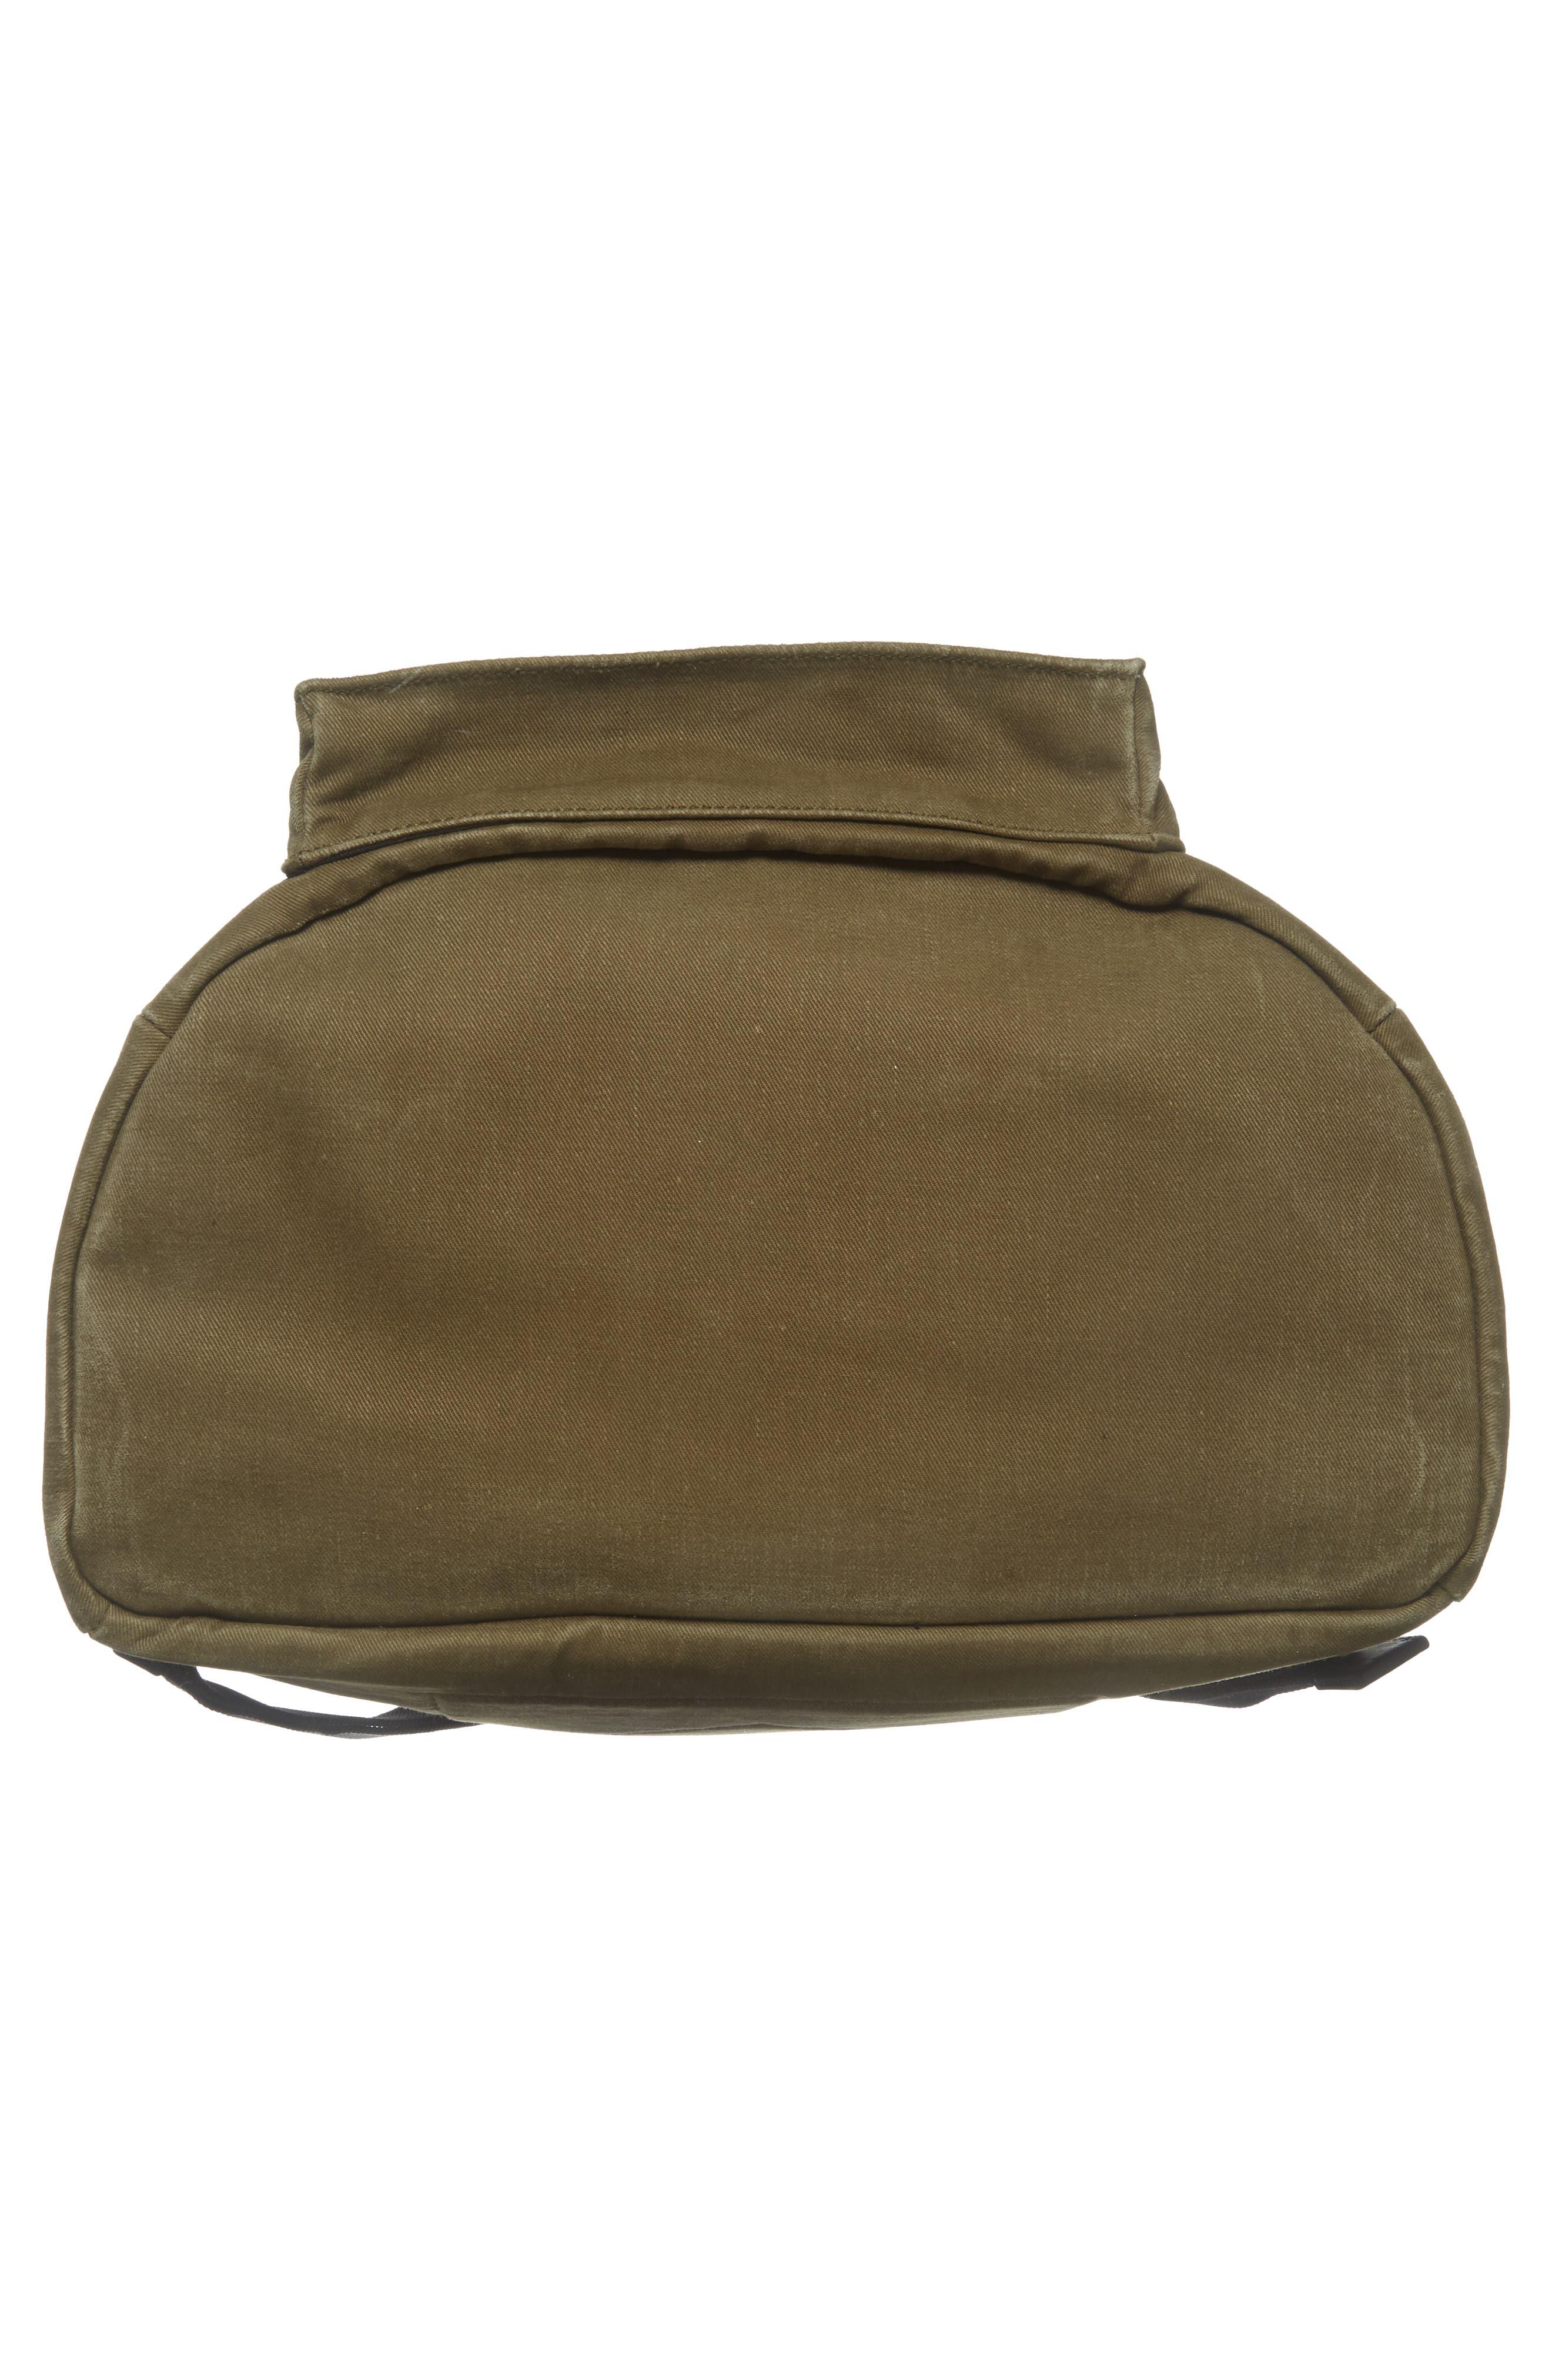 Noe Flap Backpack,                             Alternate thumbnail 6, color,                             300